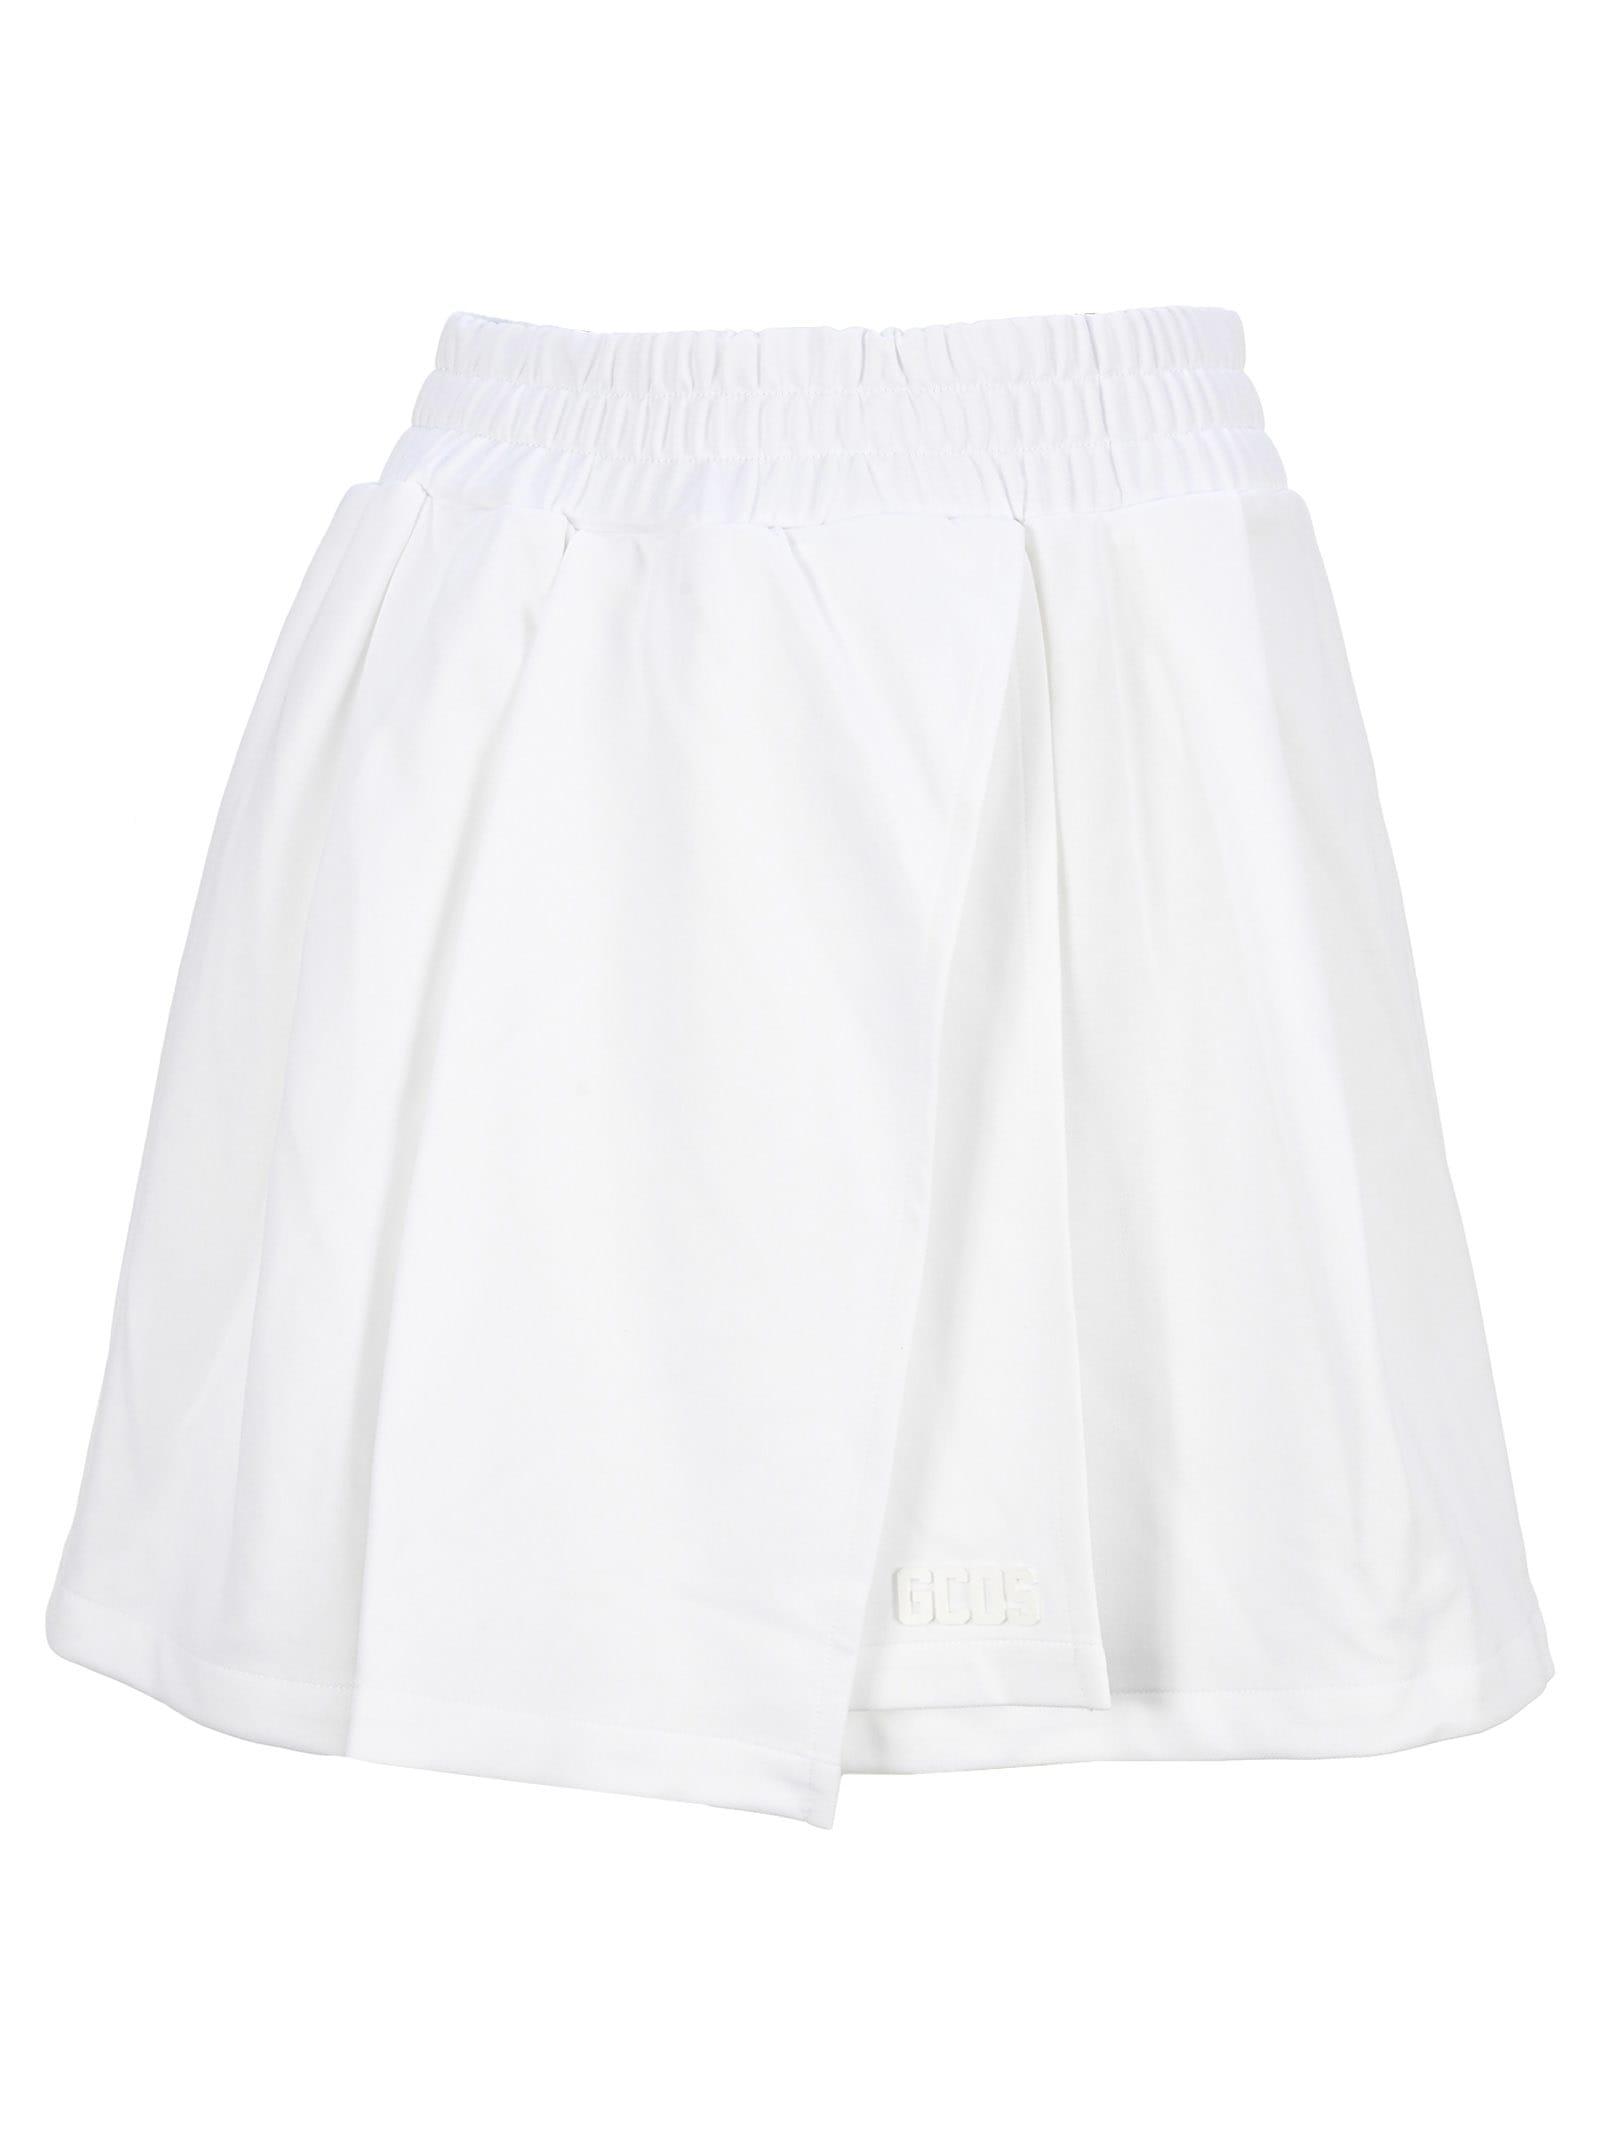 Gcds Mini skirts GCDS TRI SKIRT